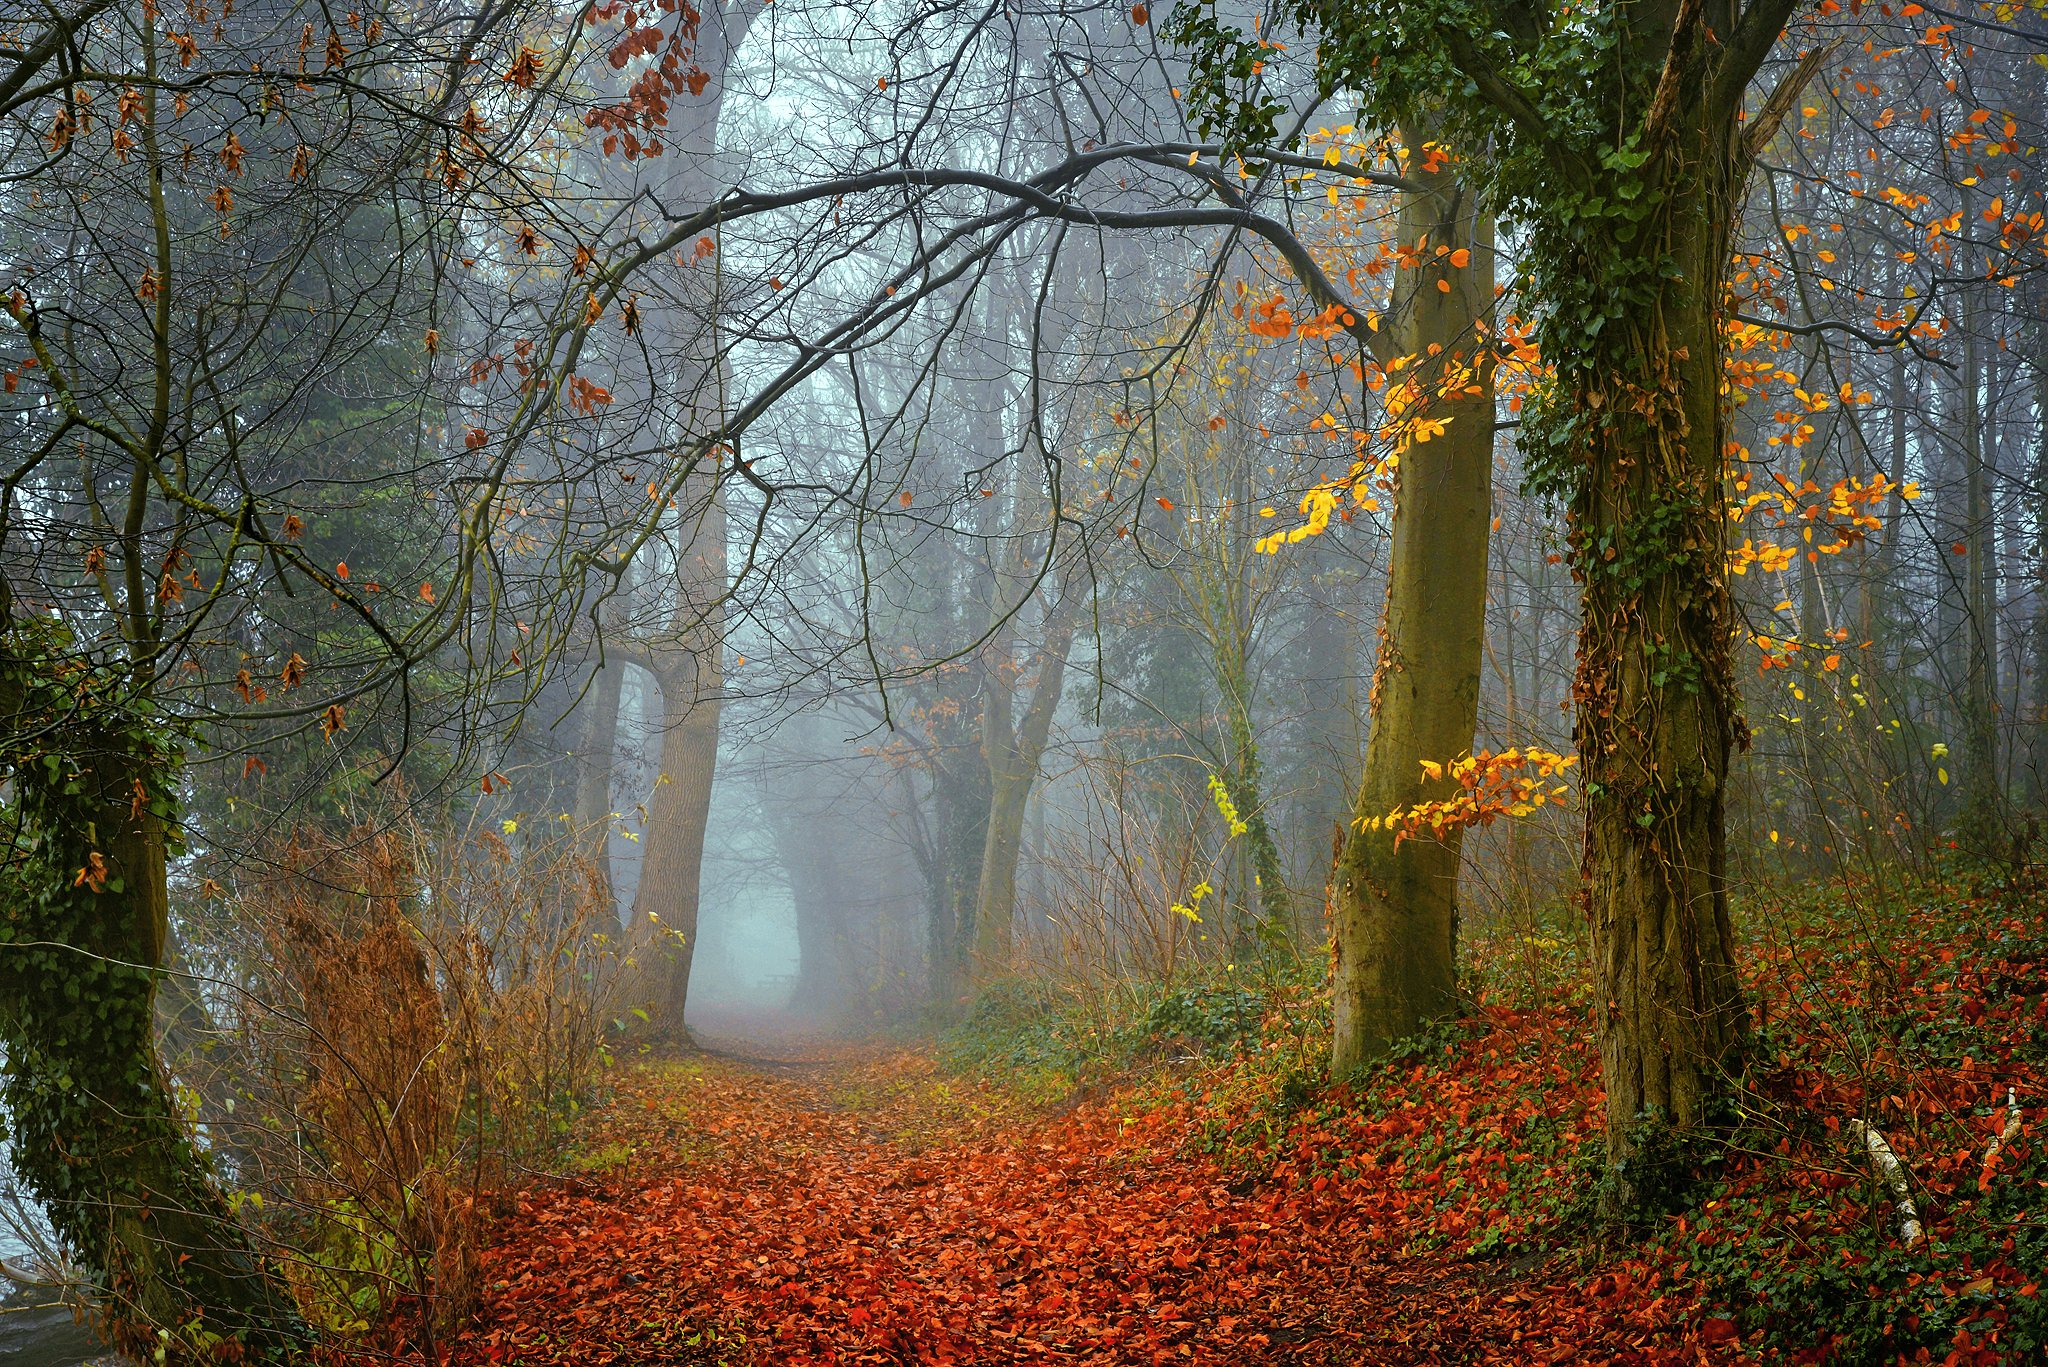 осенняя аллея autumn alley dranikowski path road mist magic trees foggy colours d610 fall, Radoslaw Dranikowski